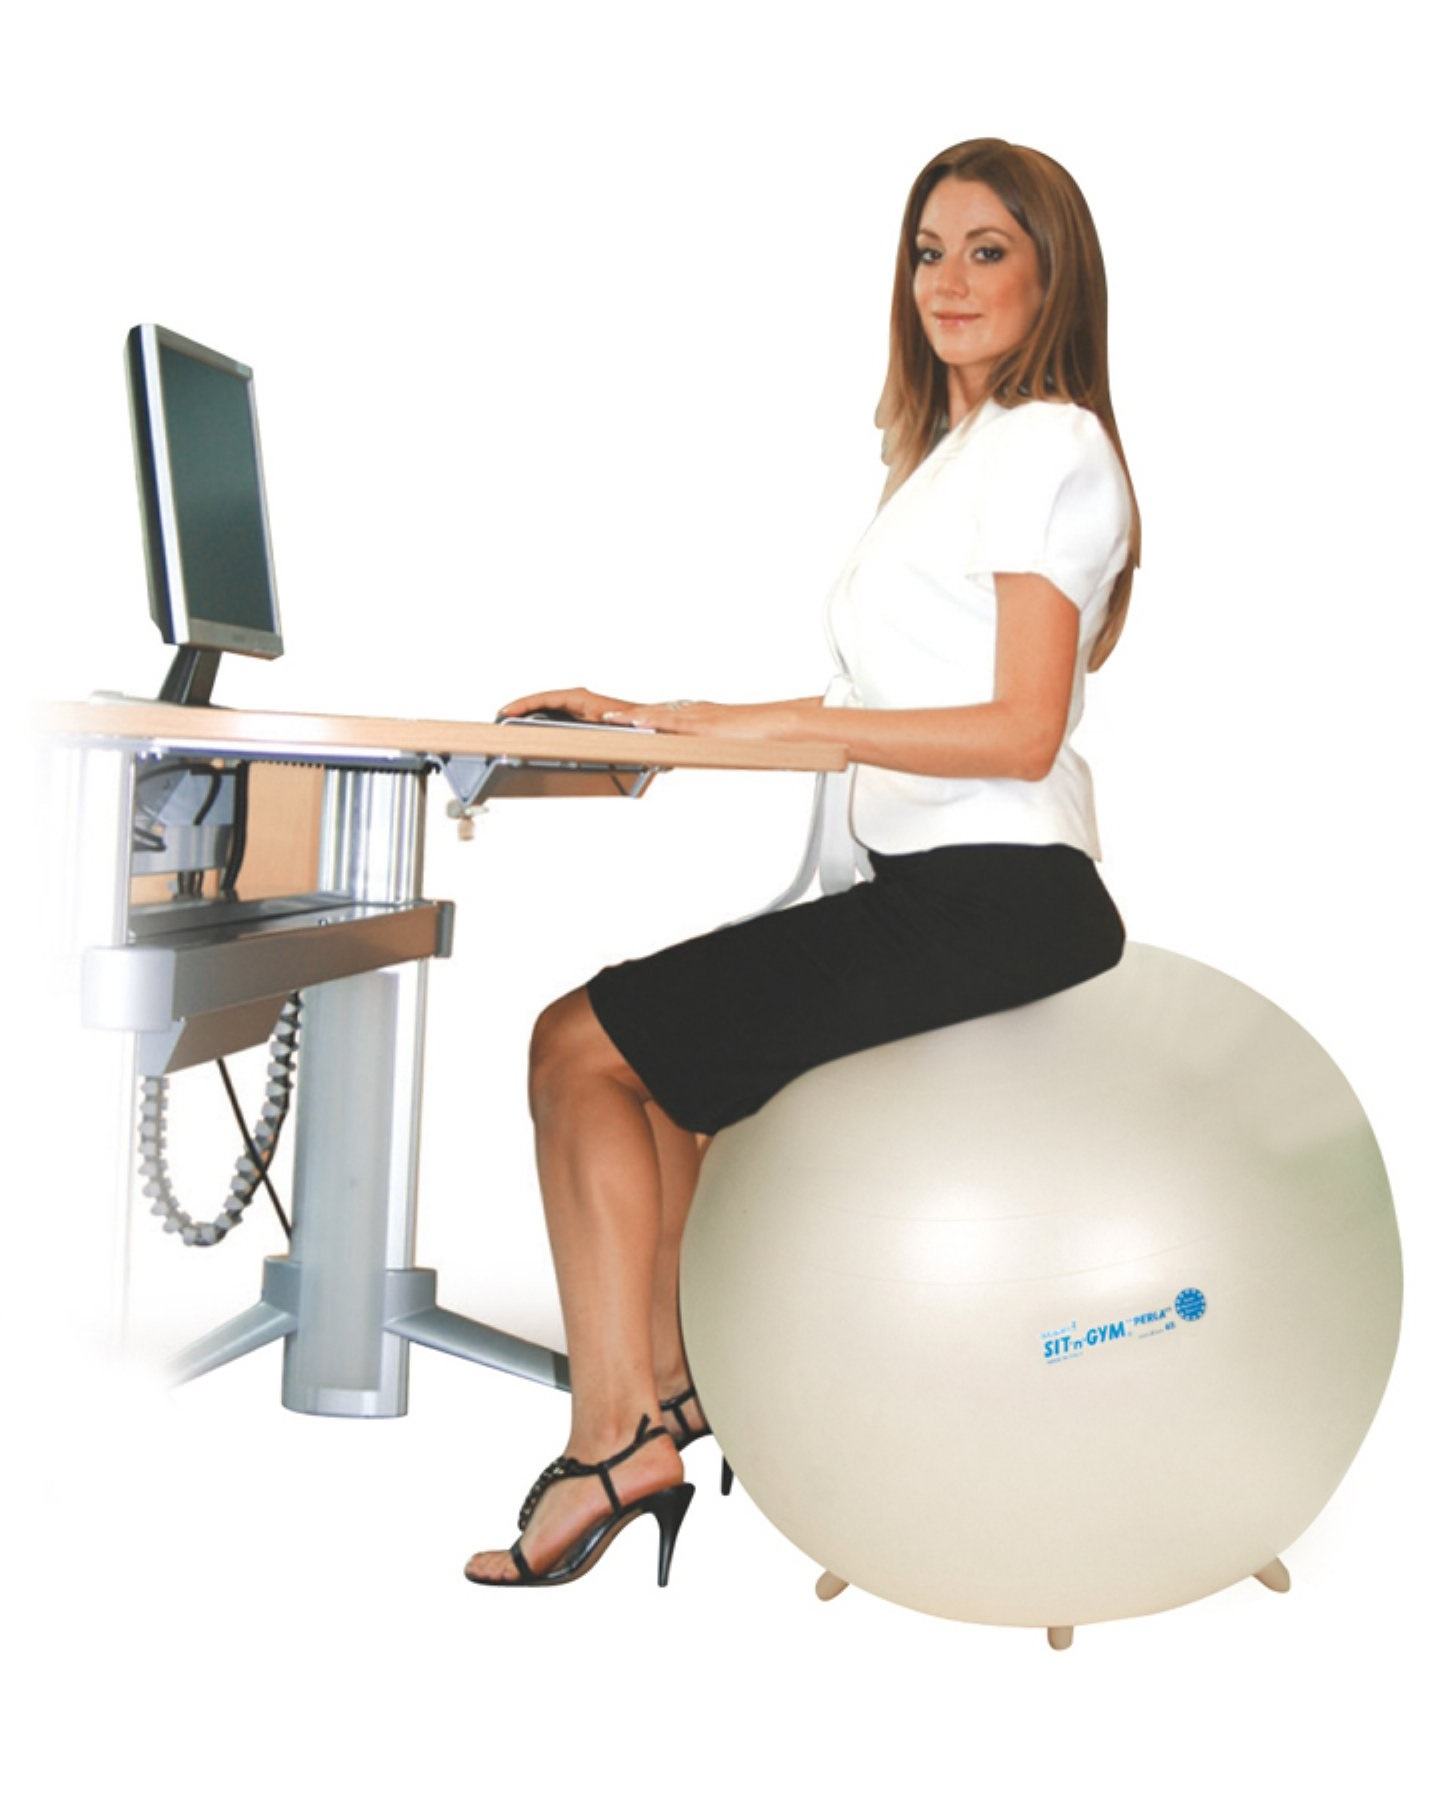 Zitbal Sit 'n' Gym